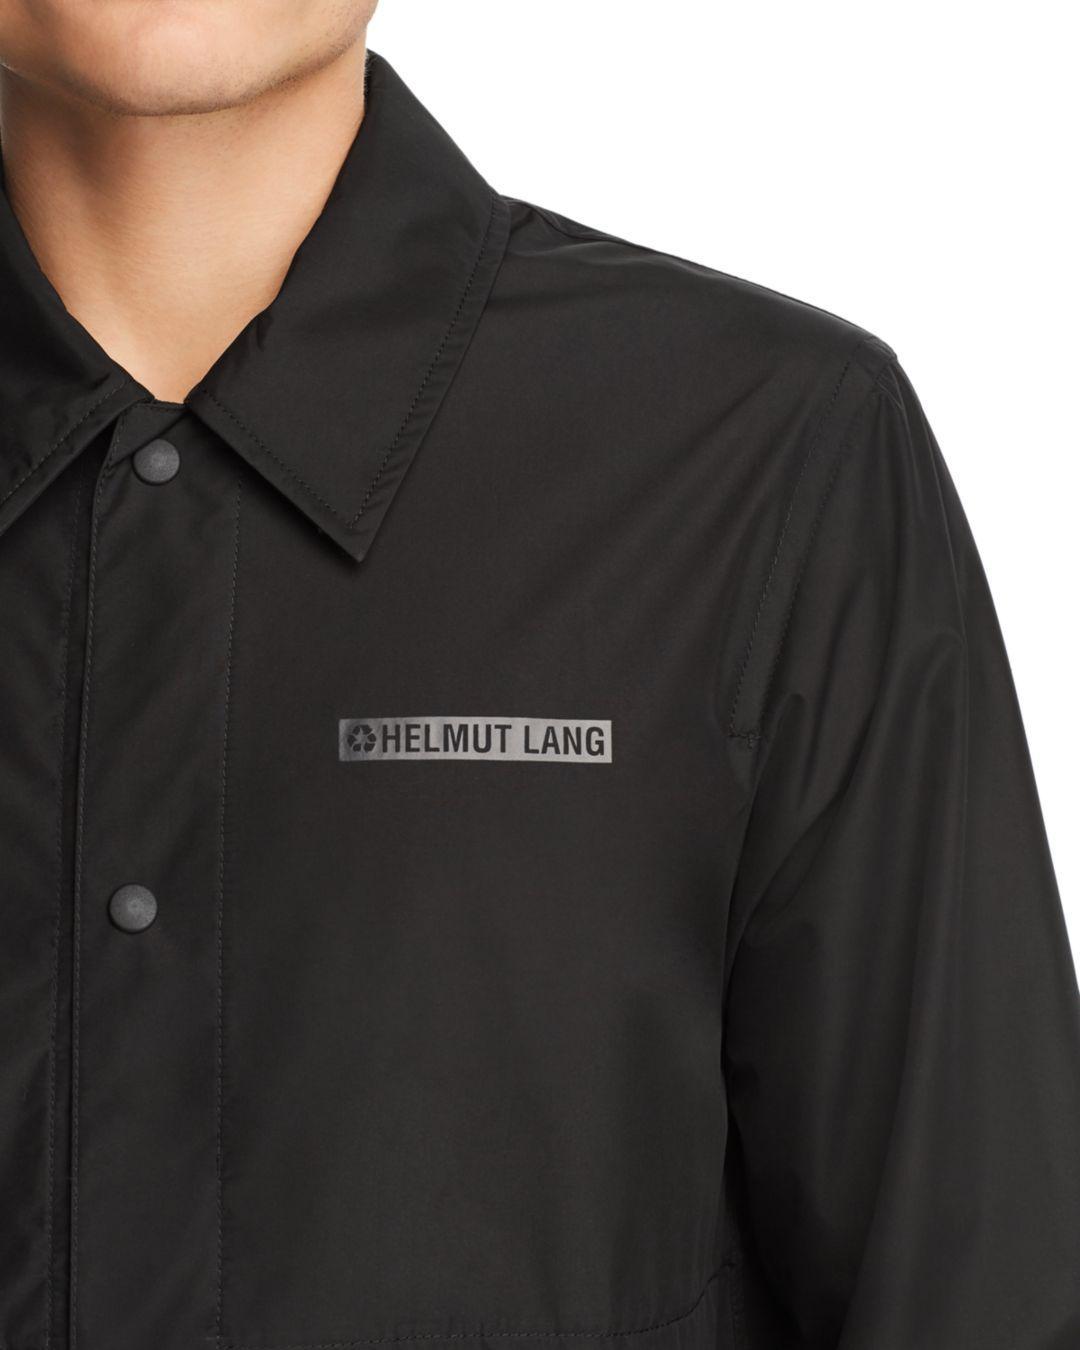 dea8a1fa2 Lyst - Helmut Lang Tonal Logo-print Stadium Jacket in Black for Men